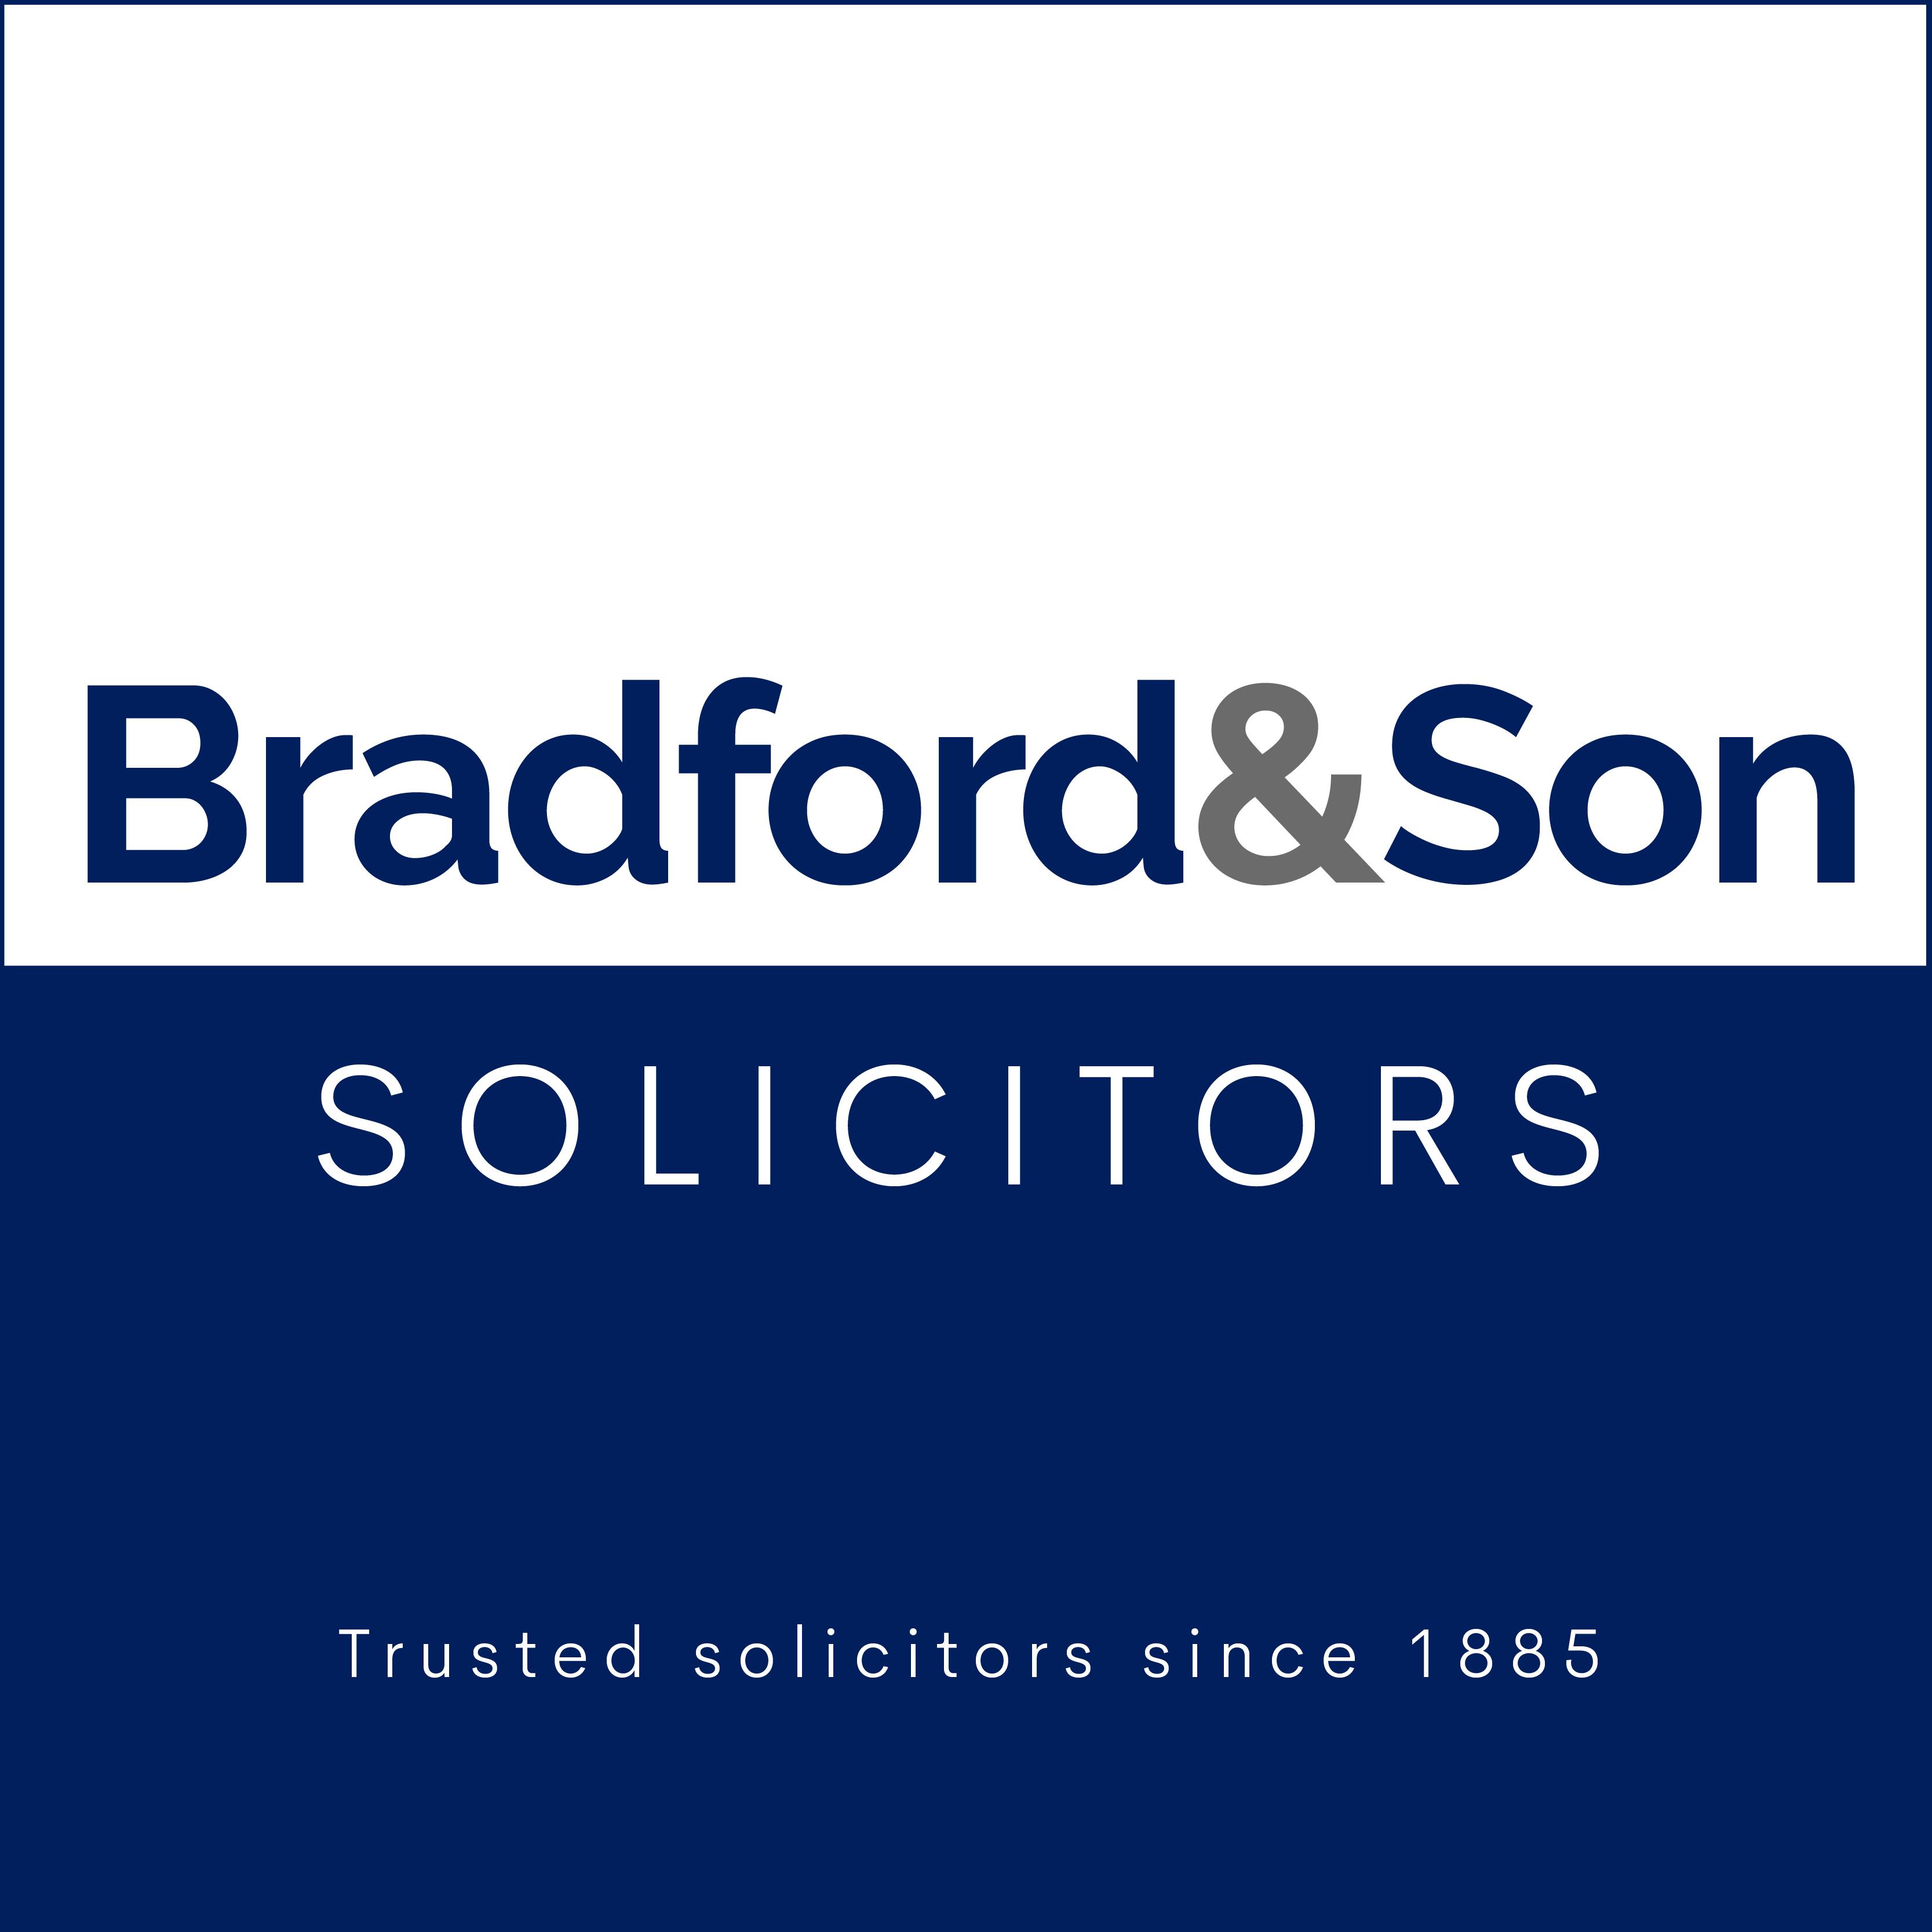 Bradford & Son Solicitors Gallery Image 1